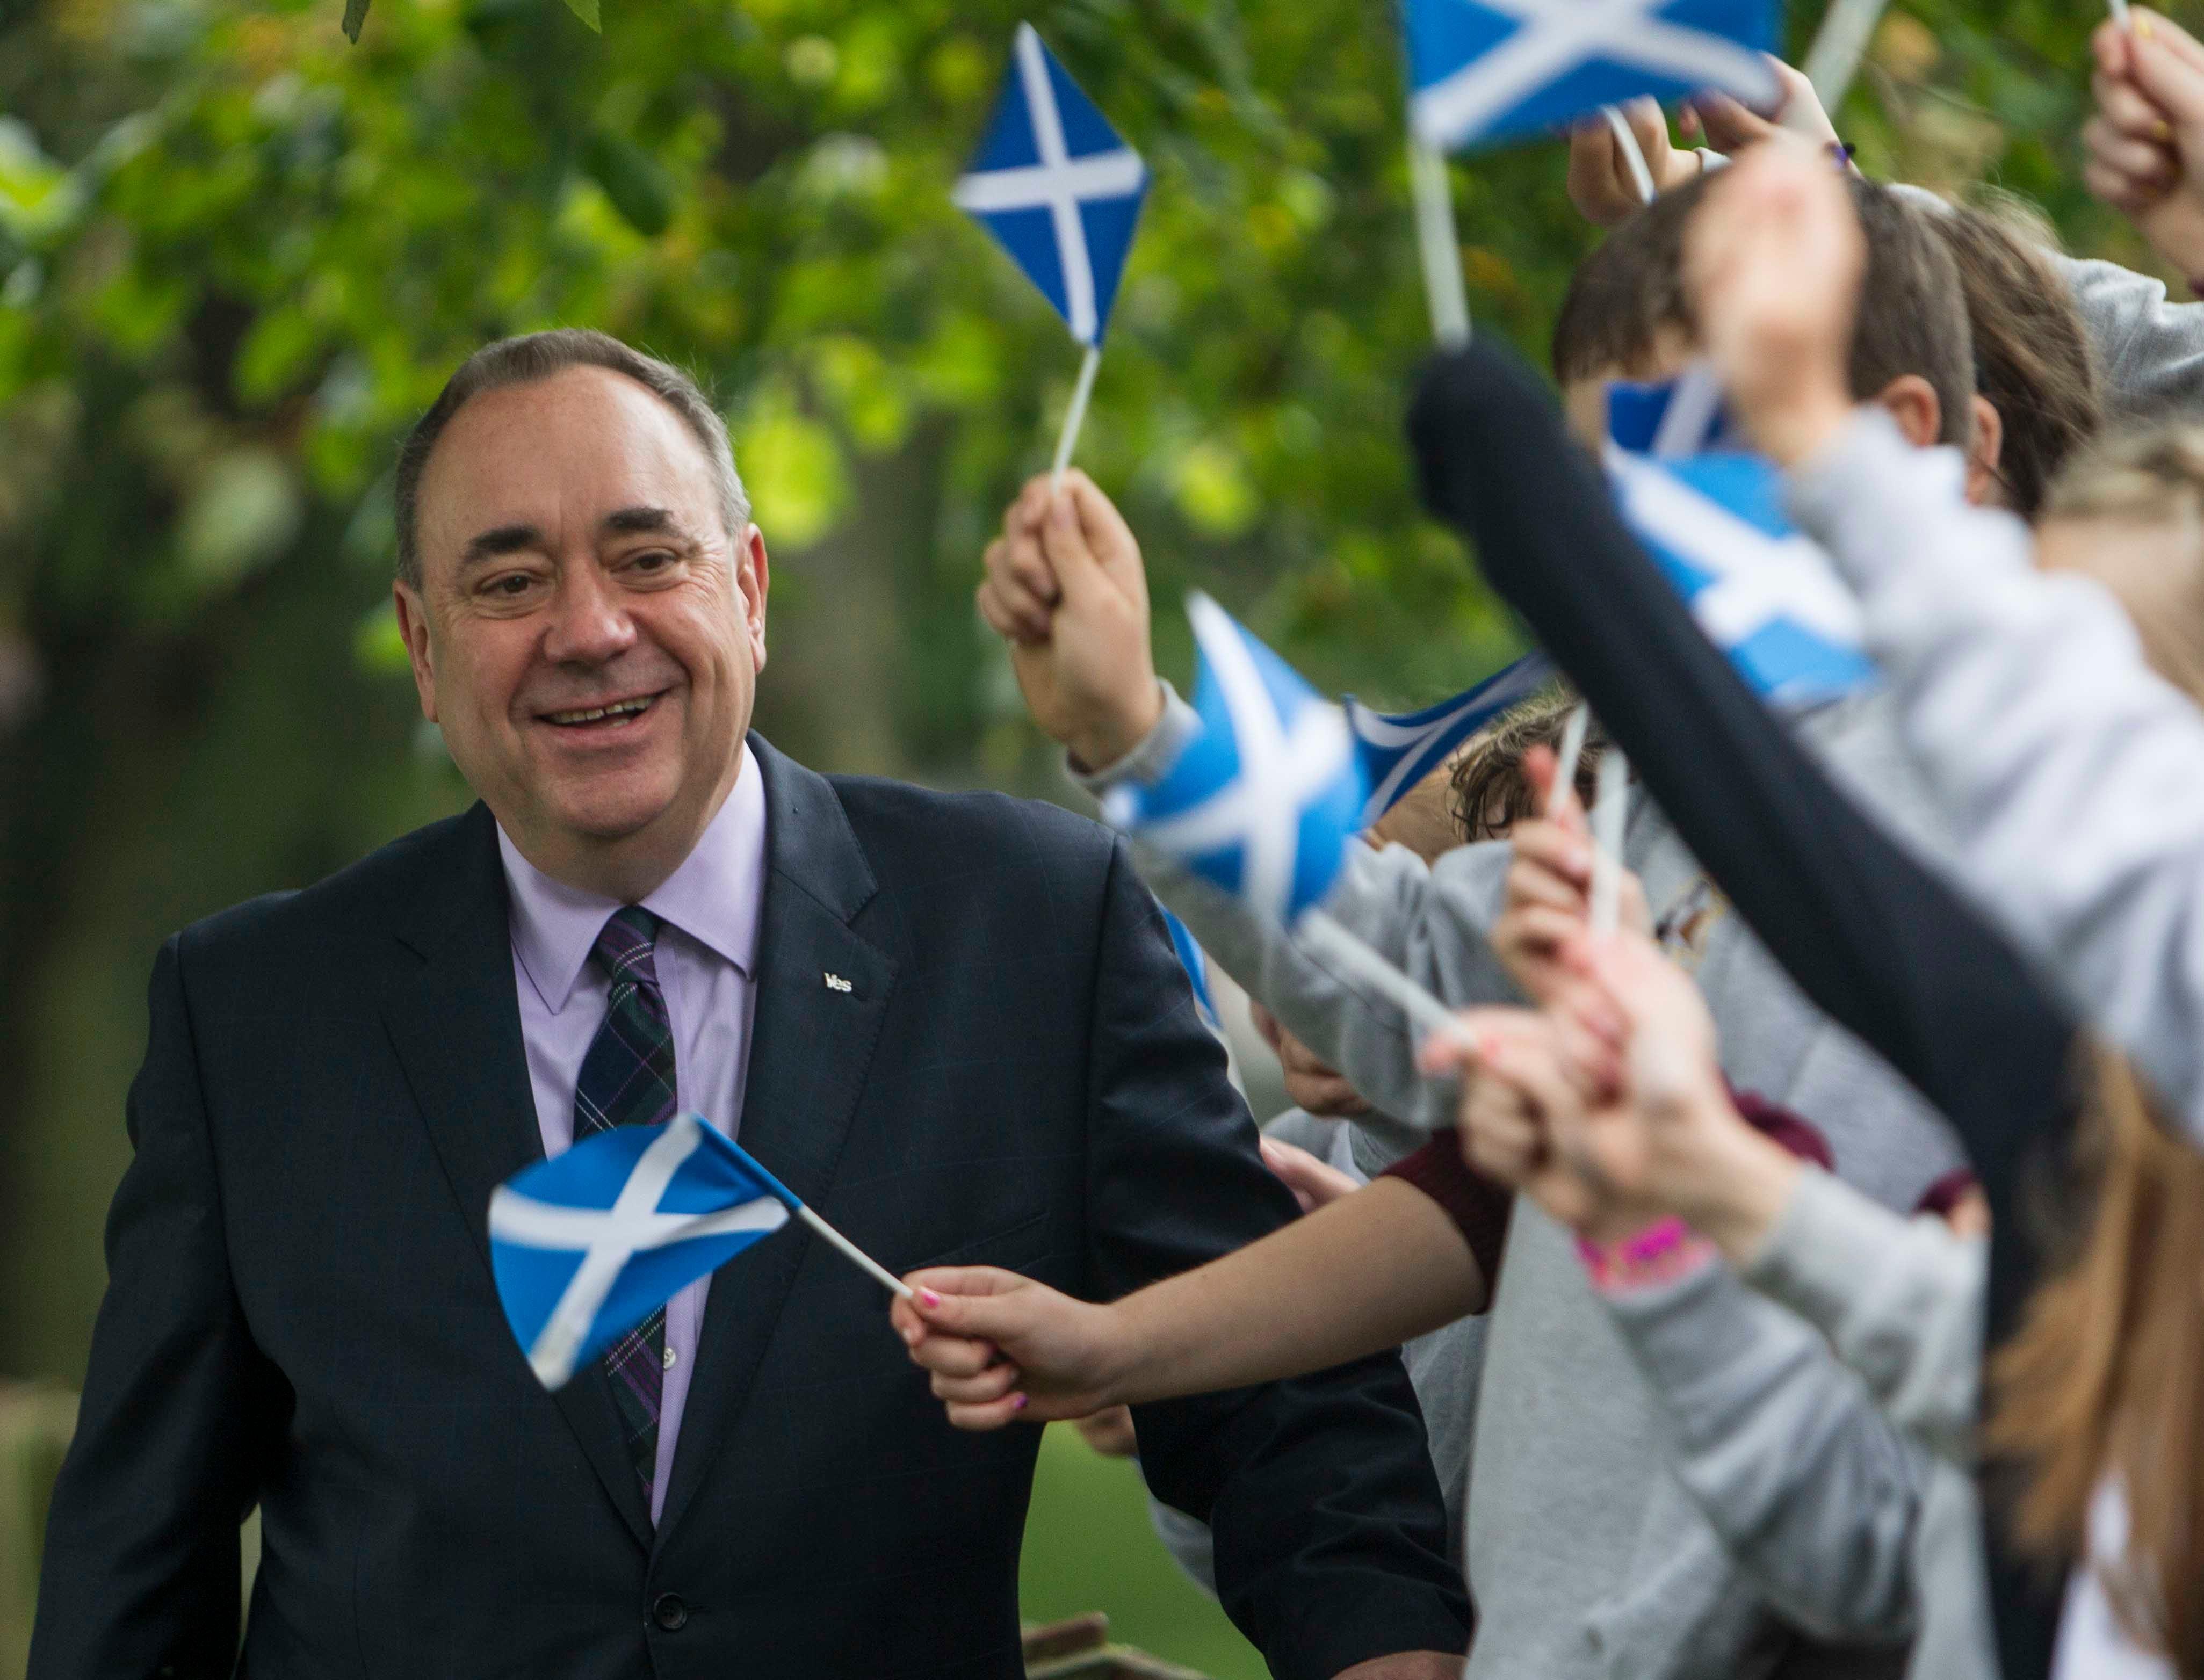 Alex Salmond casts his ballot in Scotland's independence referendum at Ritchie Hall, Strichen.